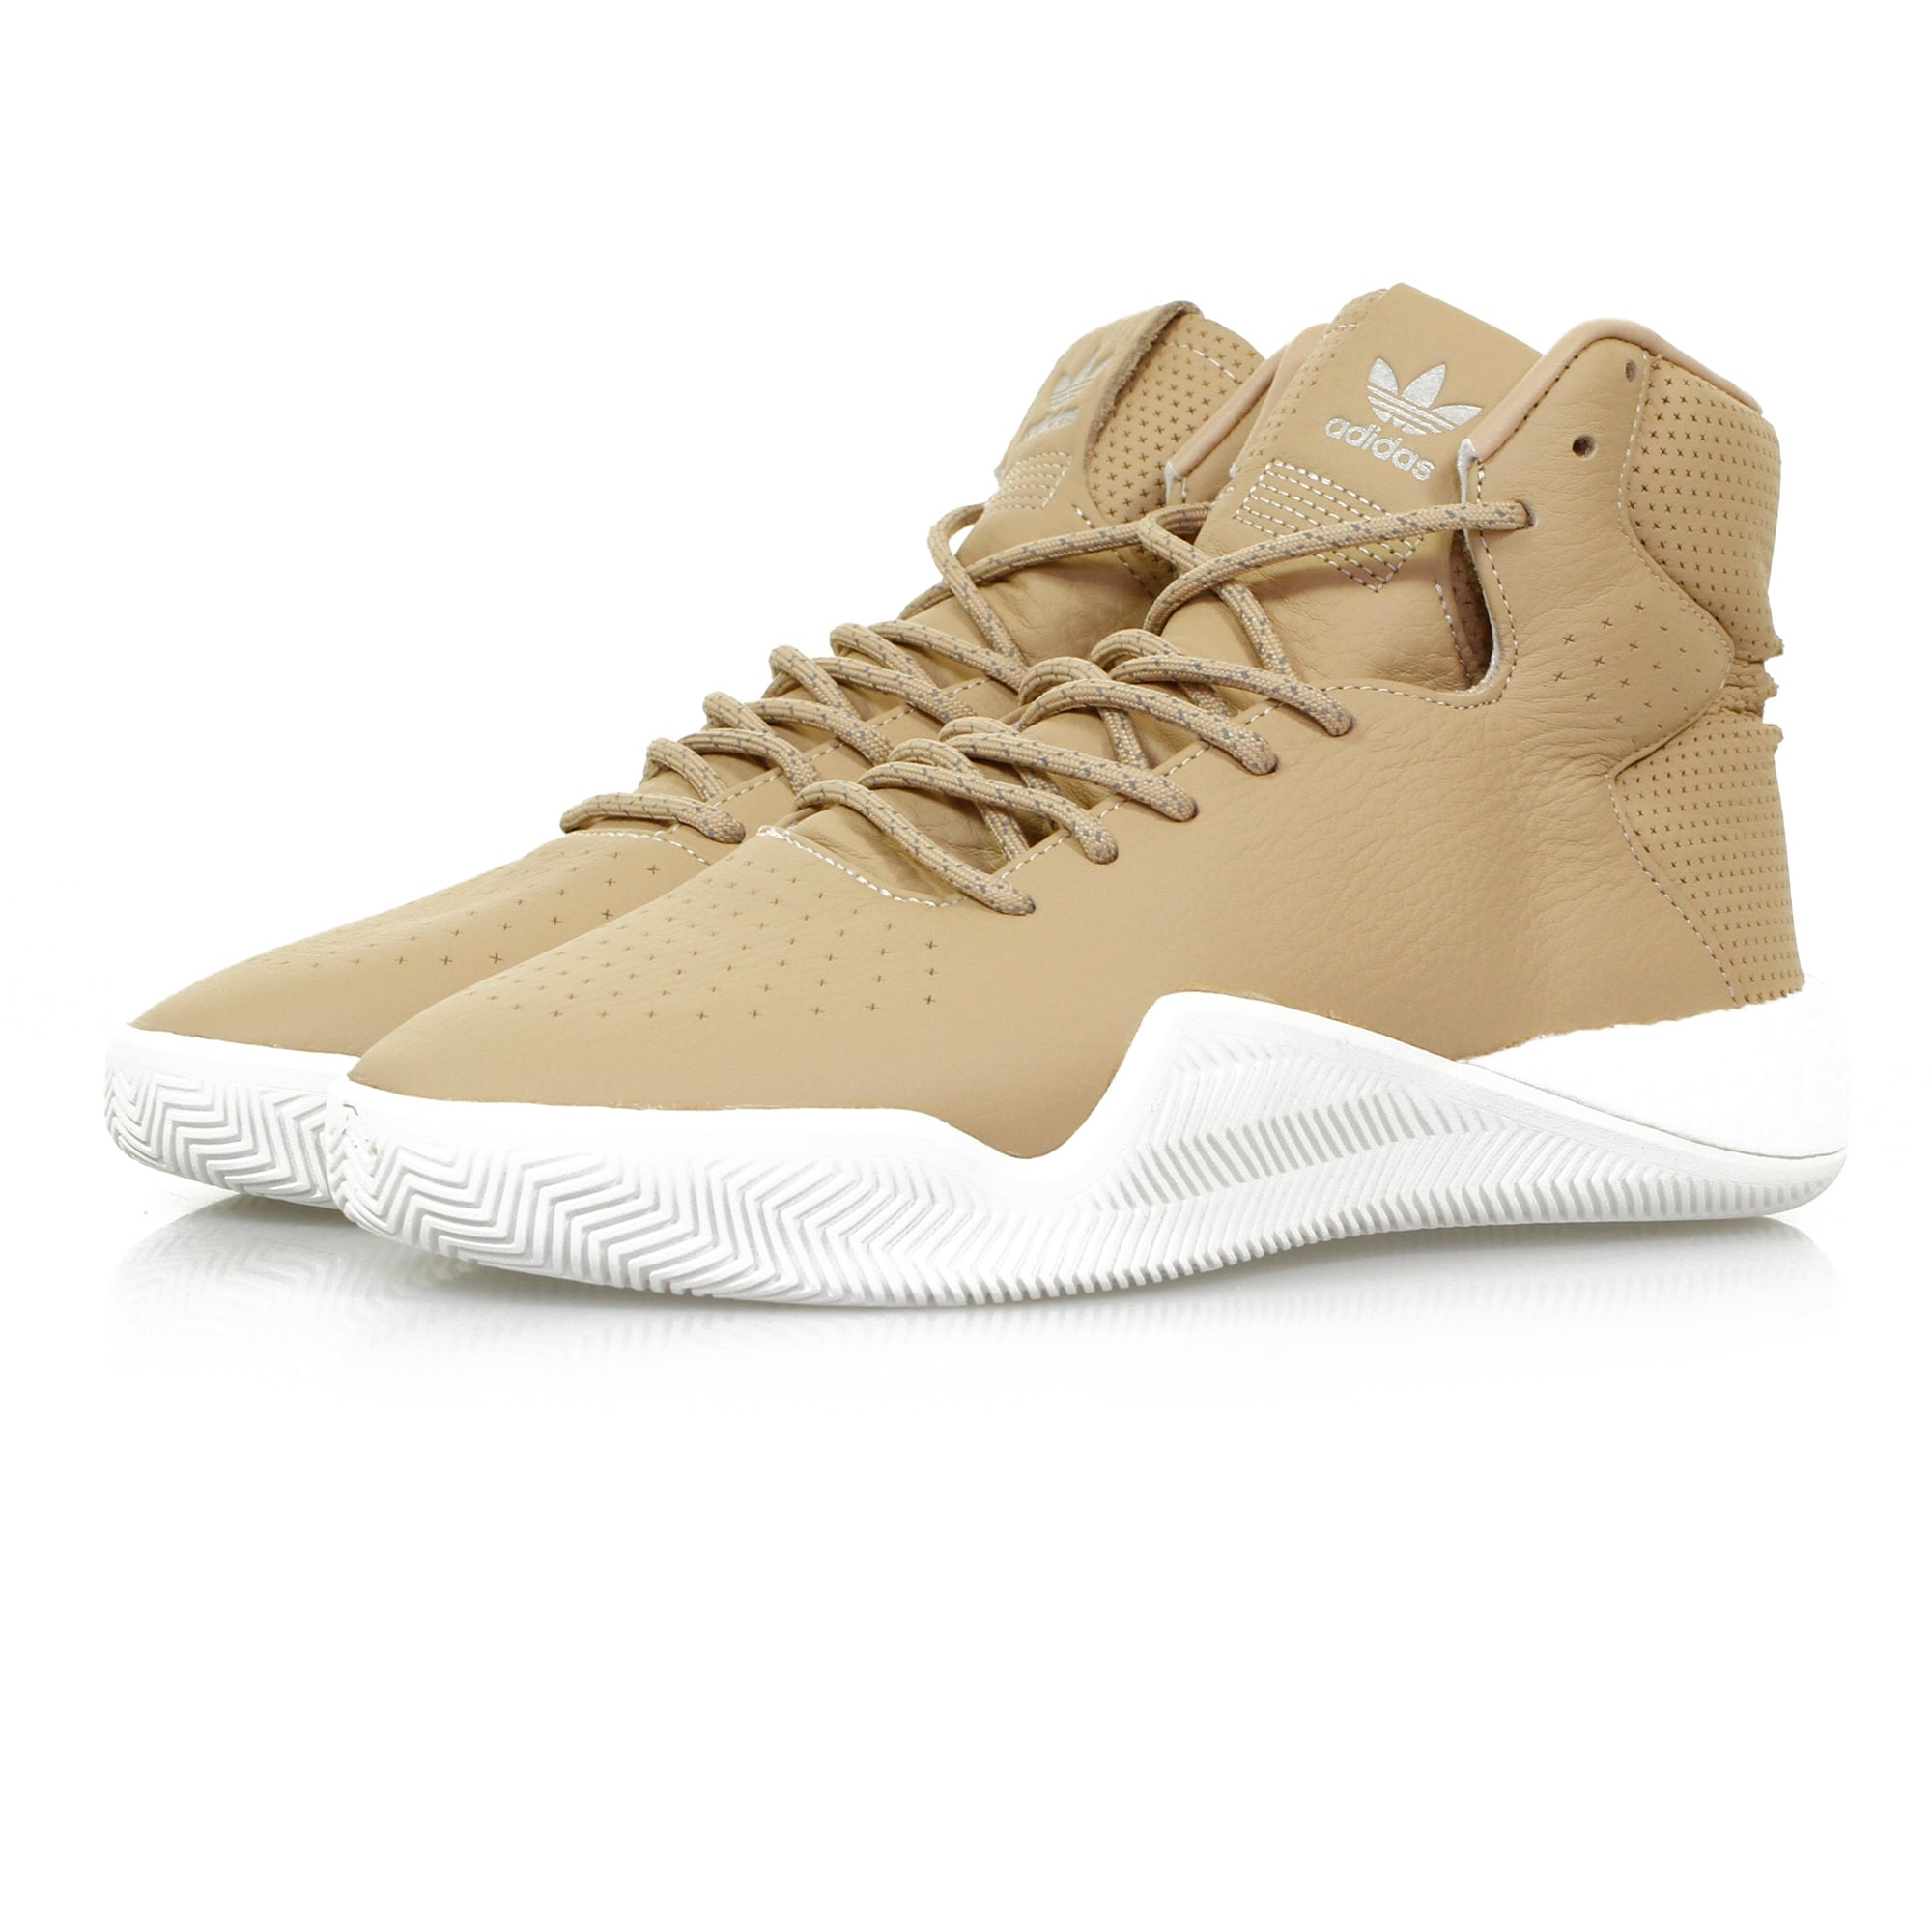 Adidas Instinct Sneakers | Tubular Instinct Adidas Boost Chalk Blanco Zapatos 4f73c0